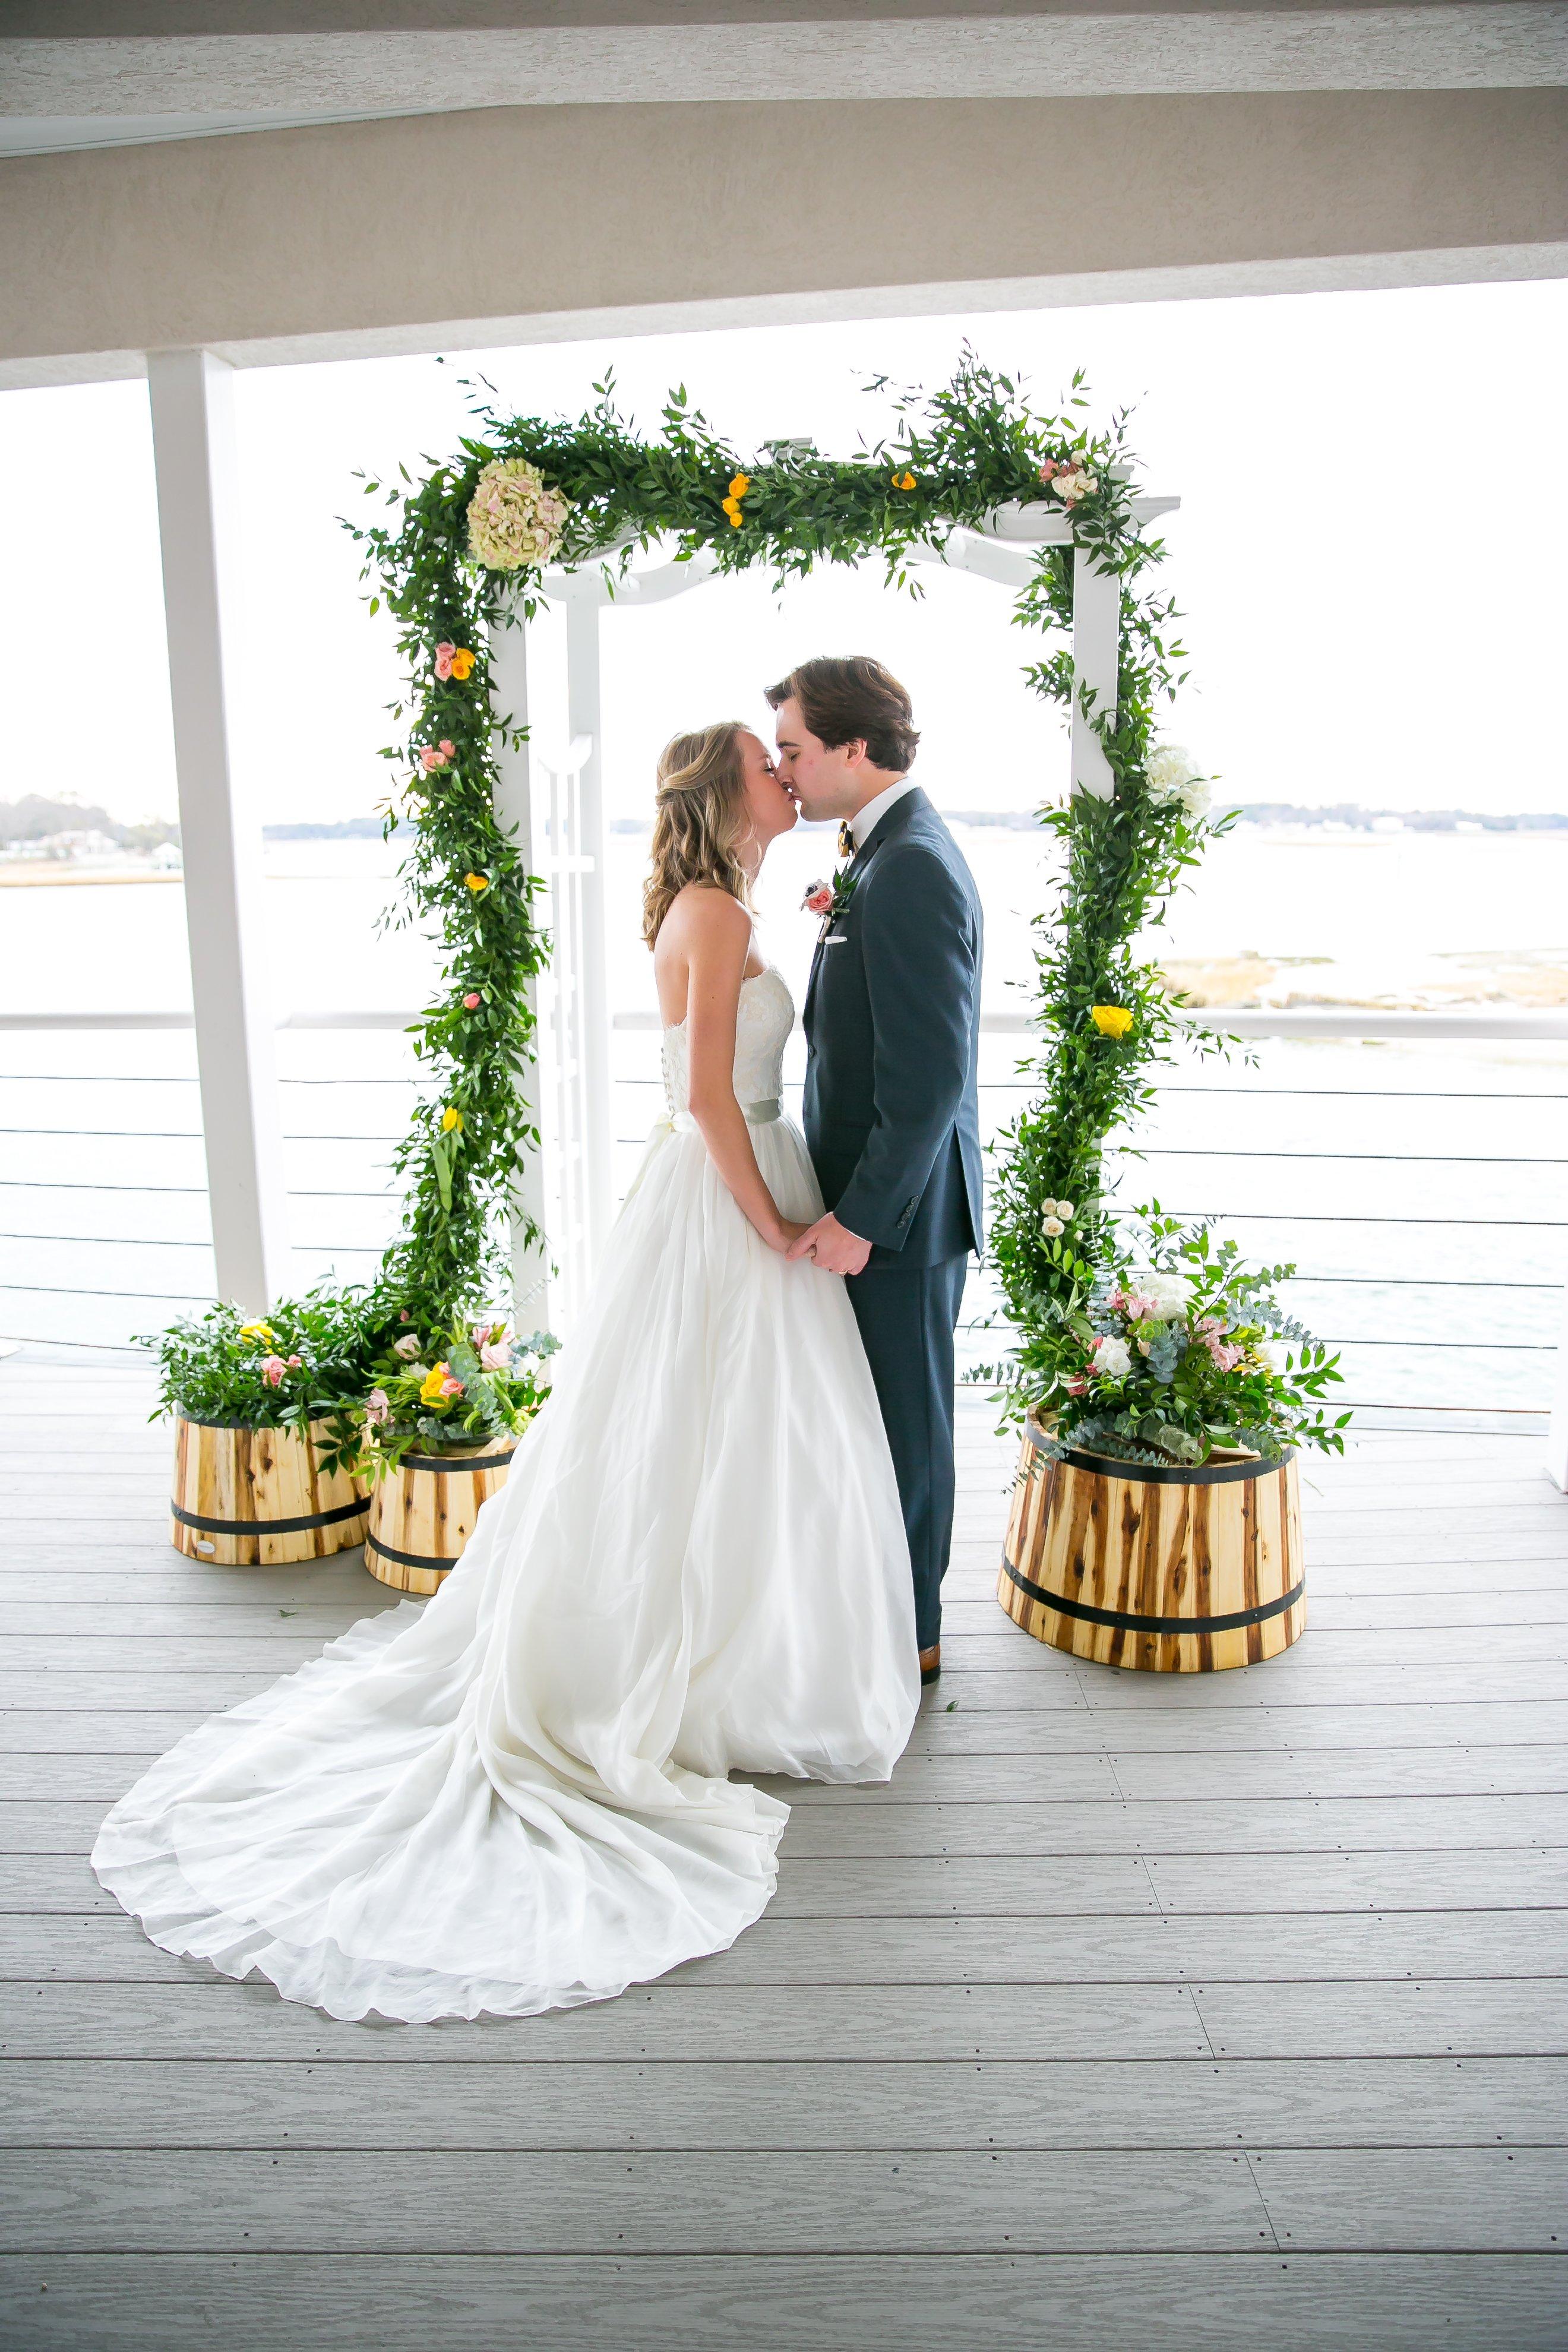 David-Champagne-Photography-Fluttering-Flowers-Florist-Virginia-Beach-Lesner-Inn-Wedding-Venue-1